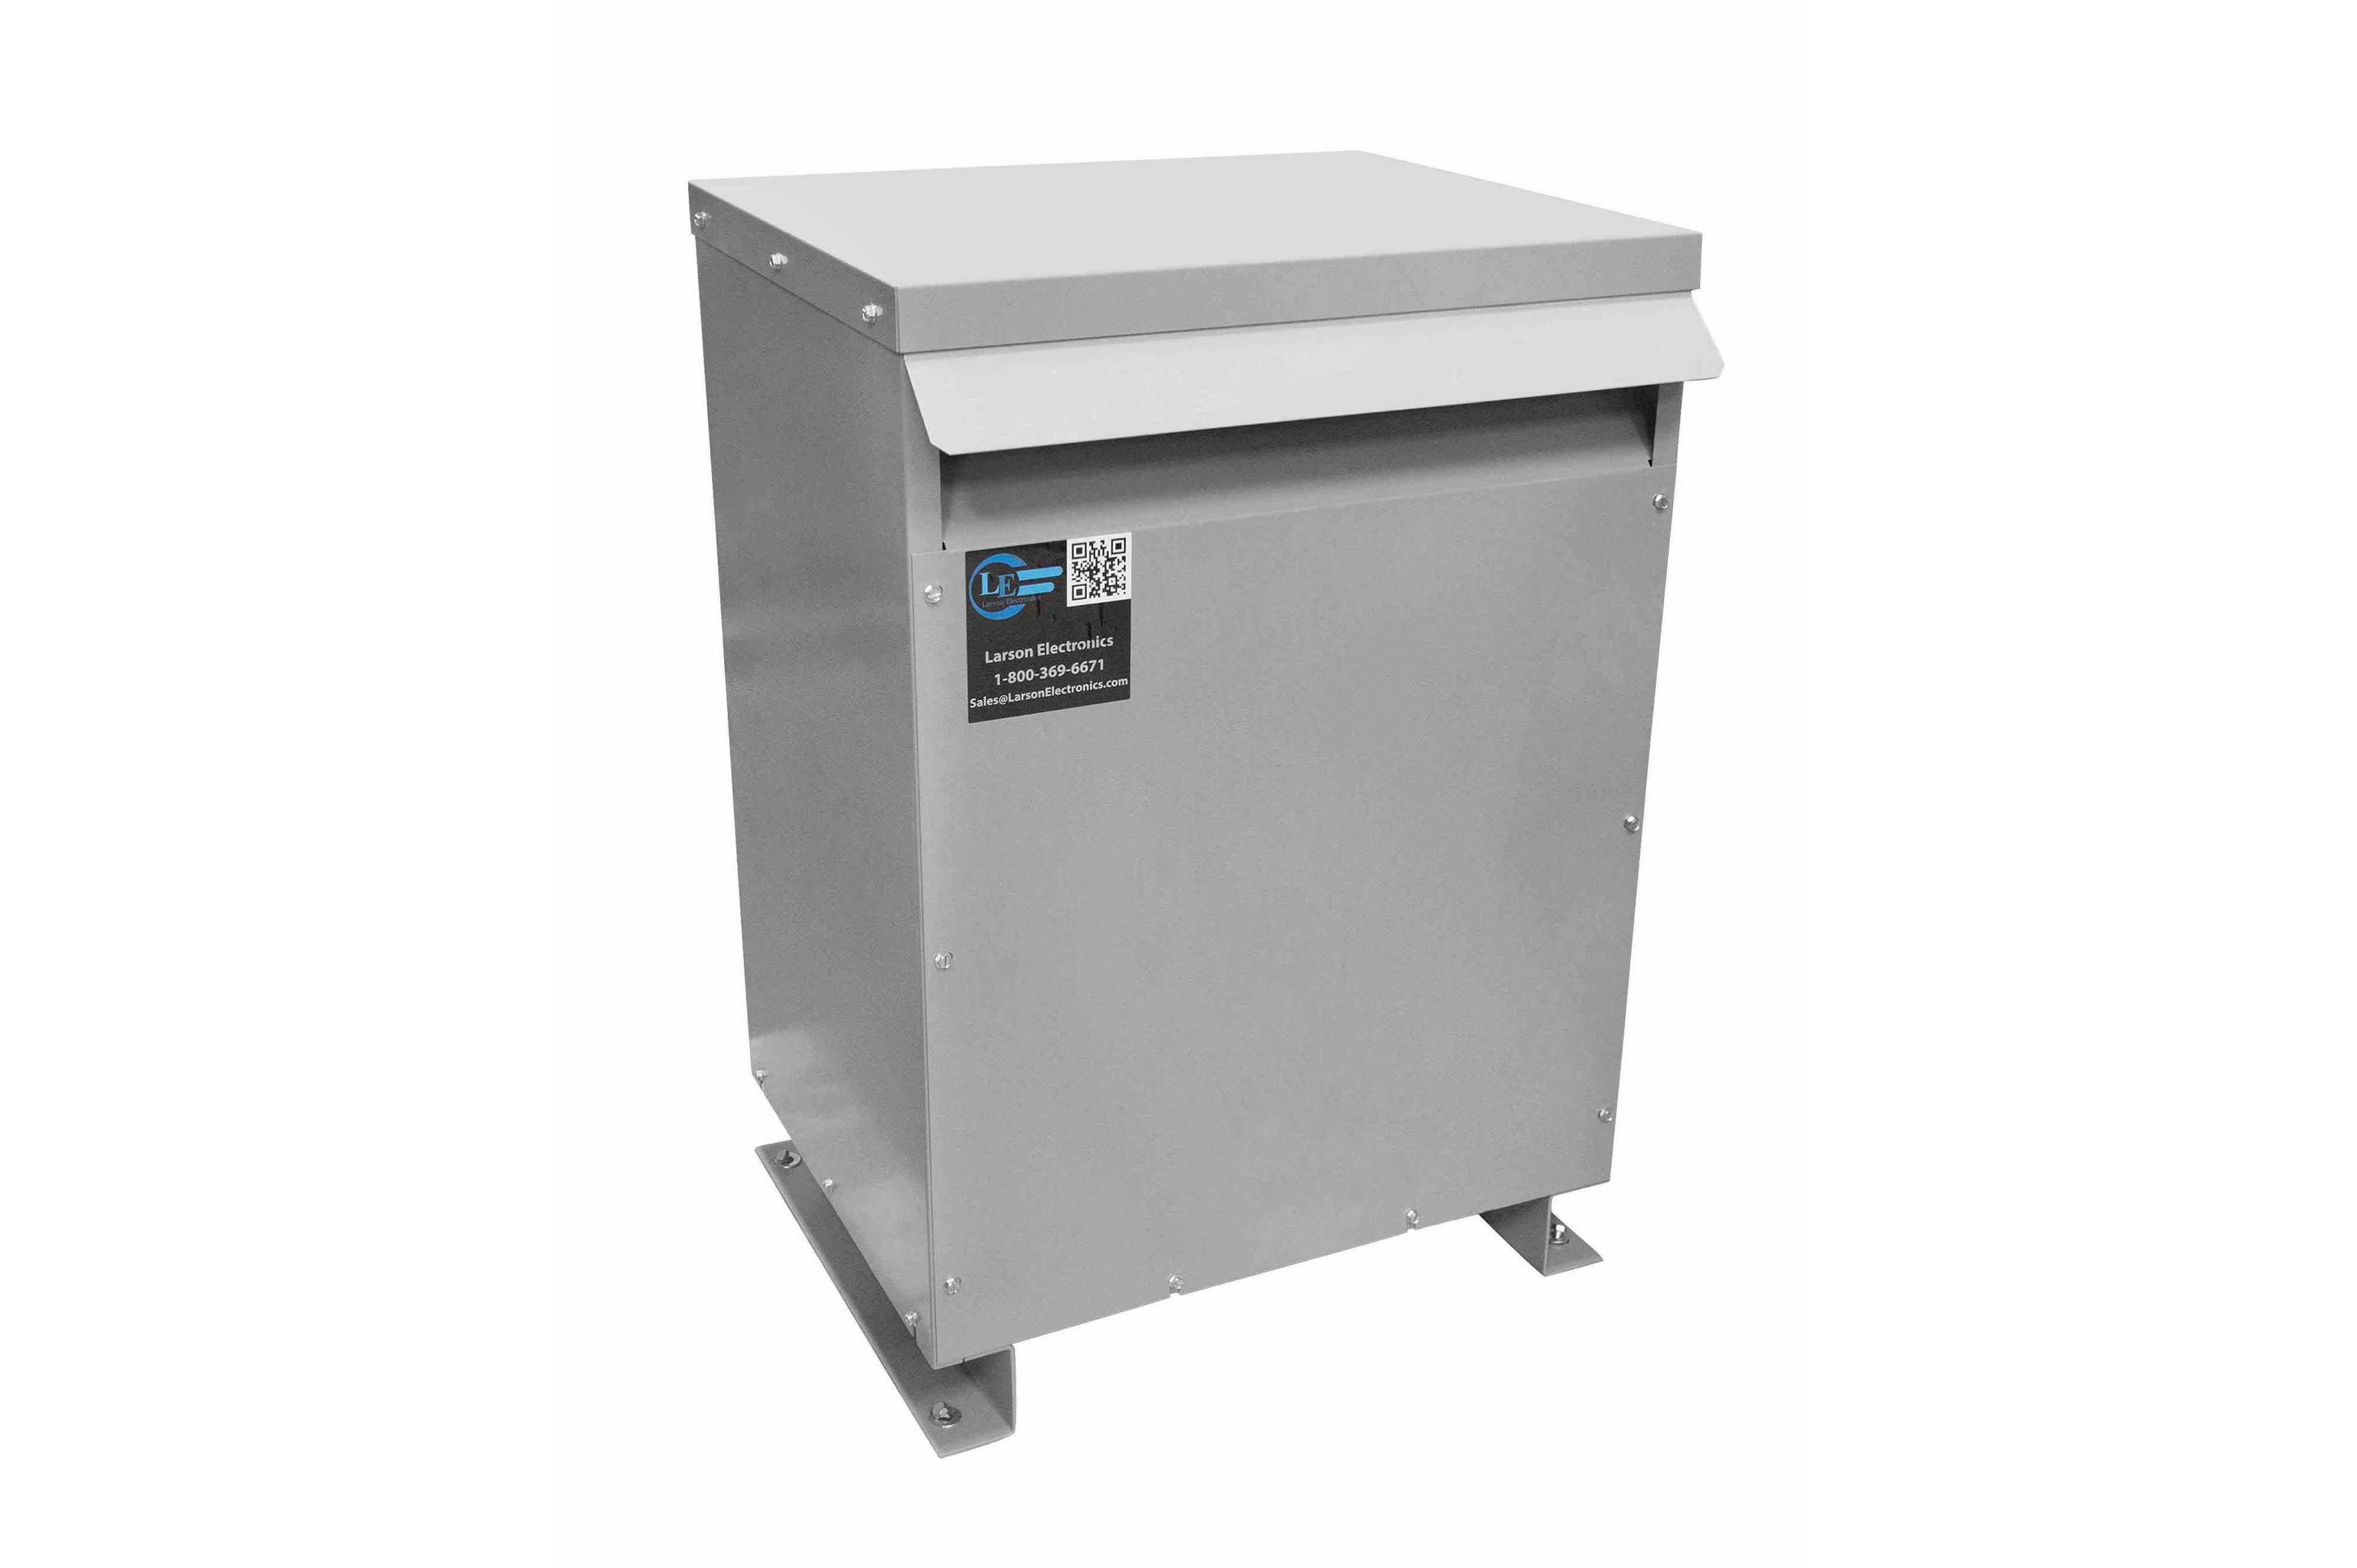 75 kVA 3PH Isolation Transformer, 600V Wye Primary, 460Y/266 Wye-N Secondary, N3R, Ventilated, 60 Hz